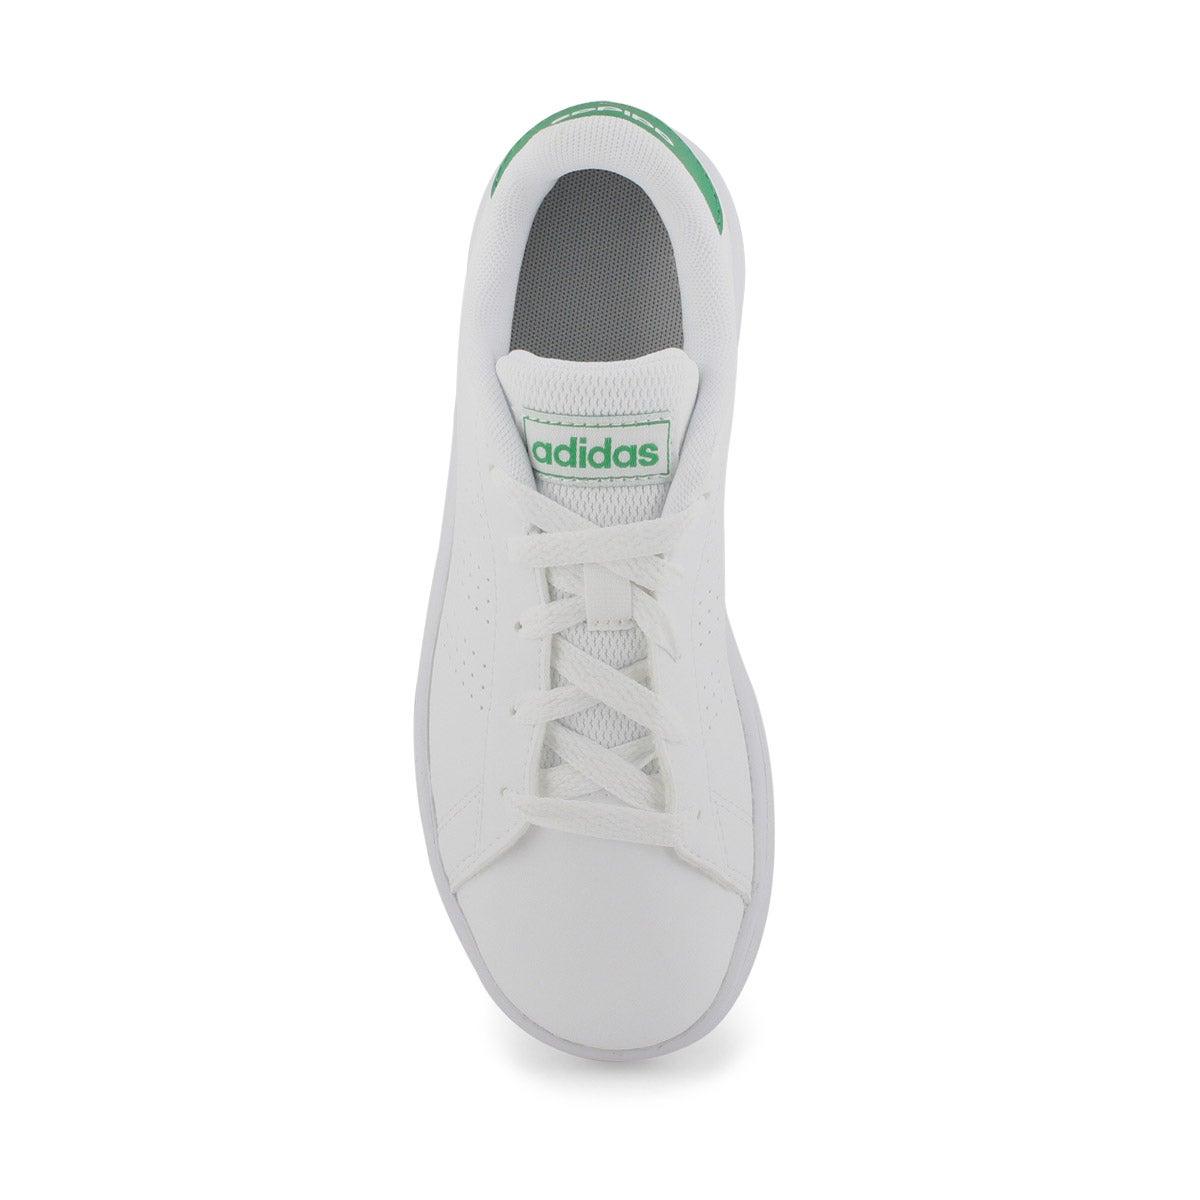 Chlds Advantage K white/green sneaker